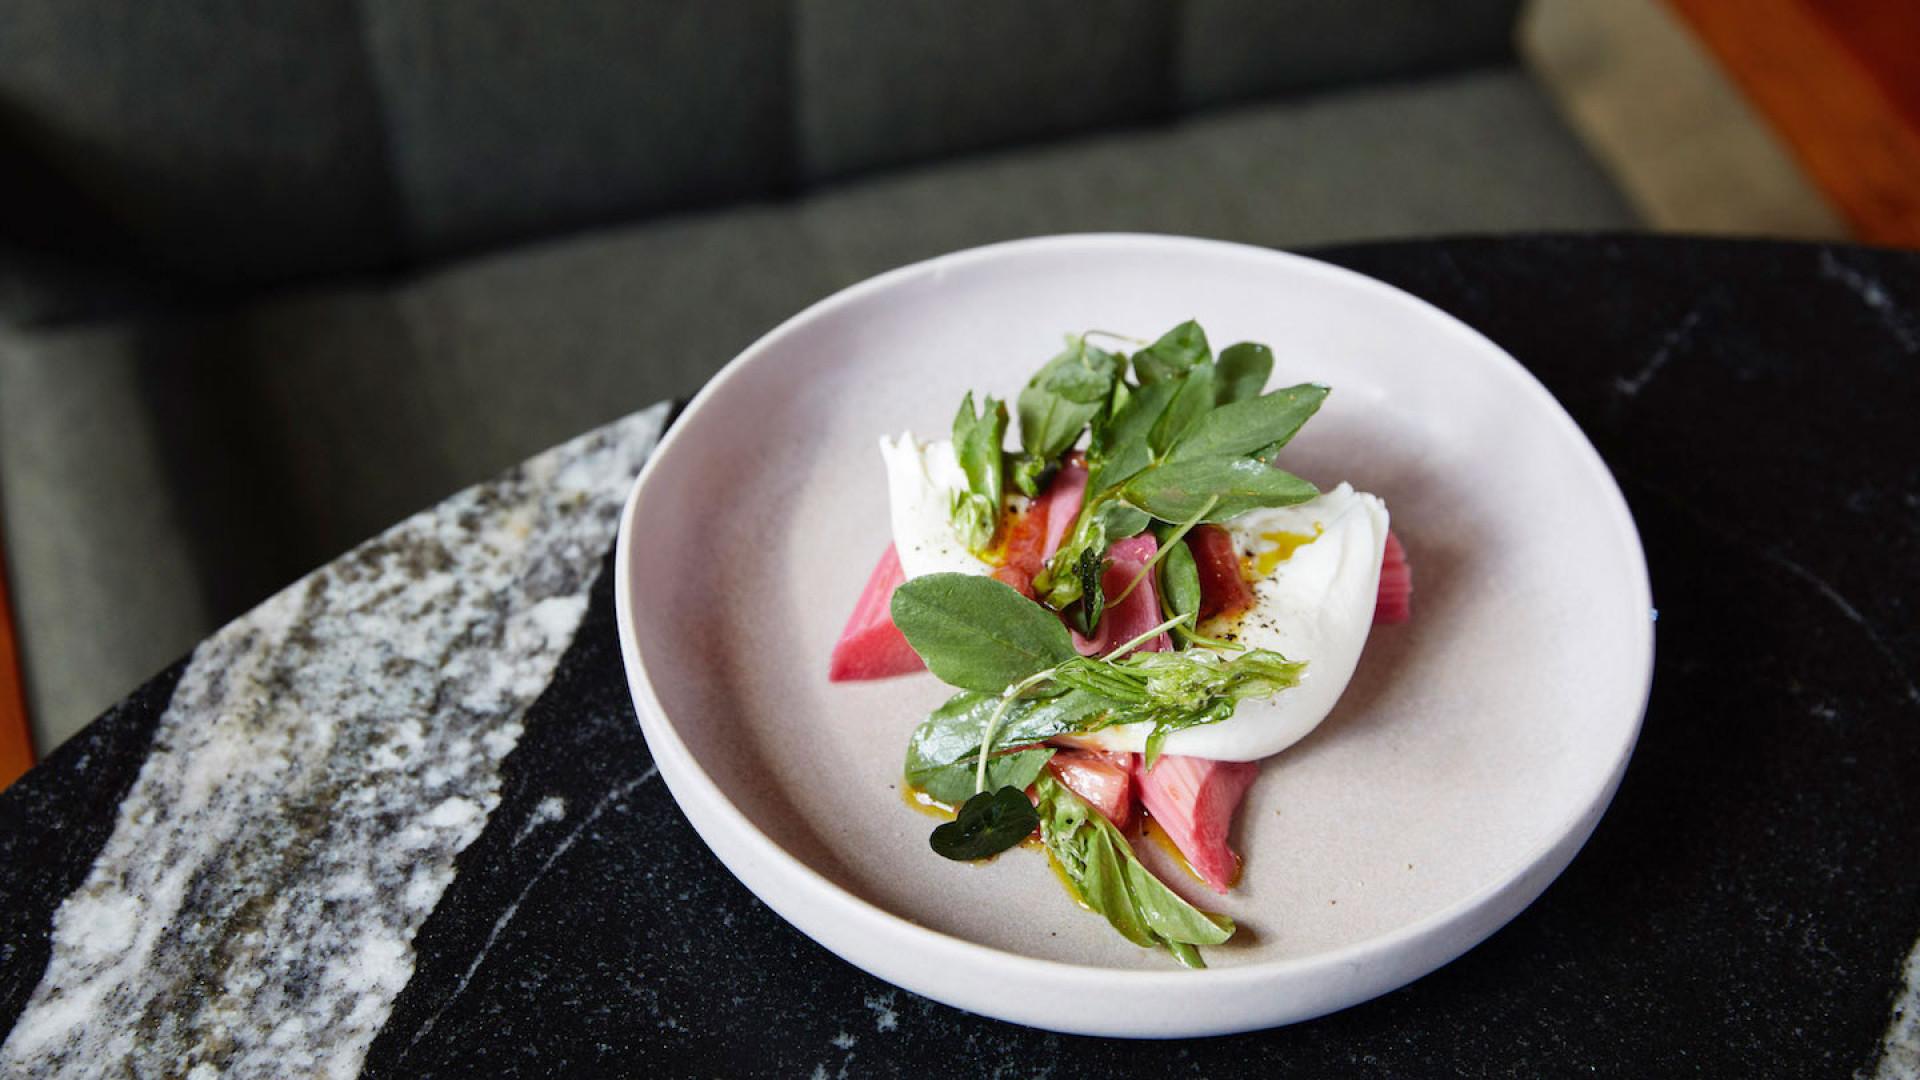 New London restaurant openings | The Light Bar's burrata, rhubarb, broad bean tops